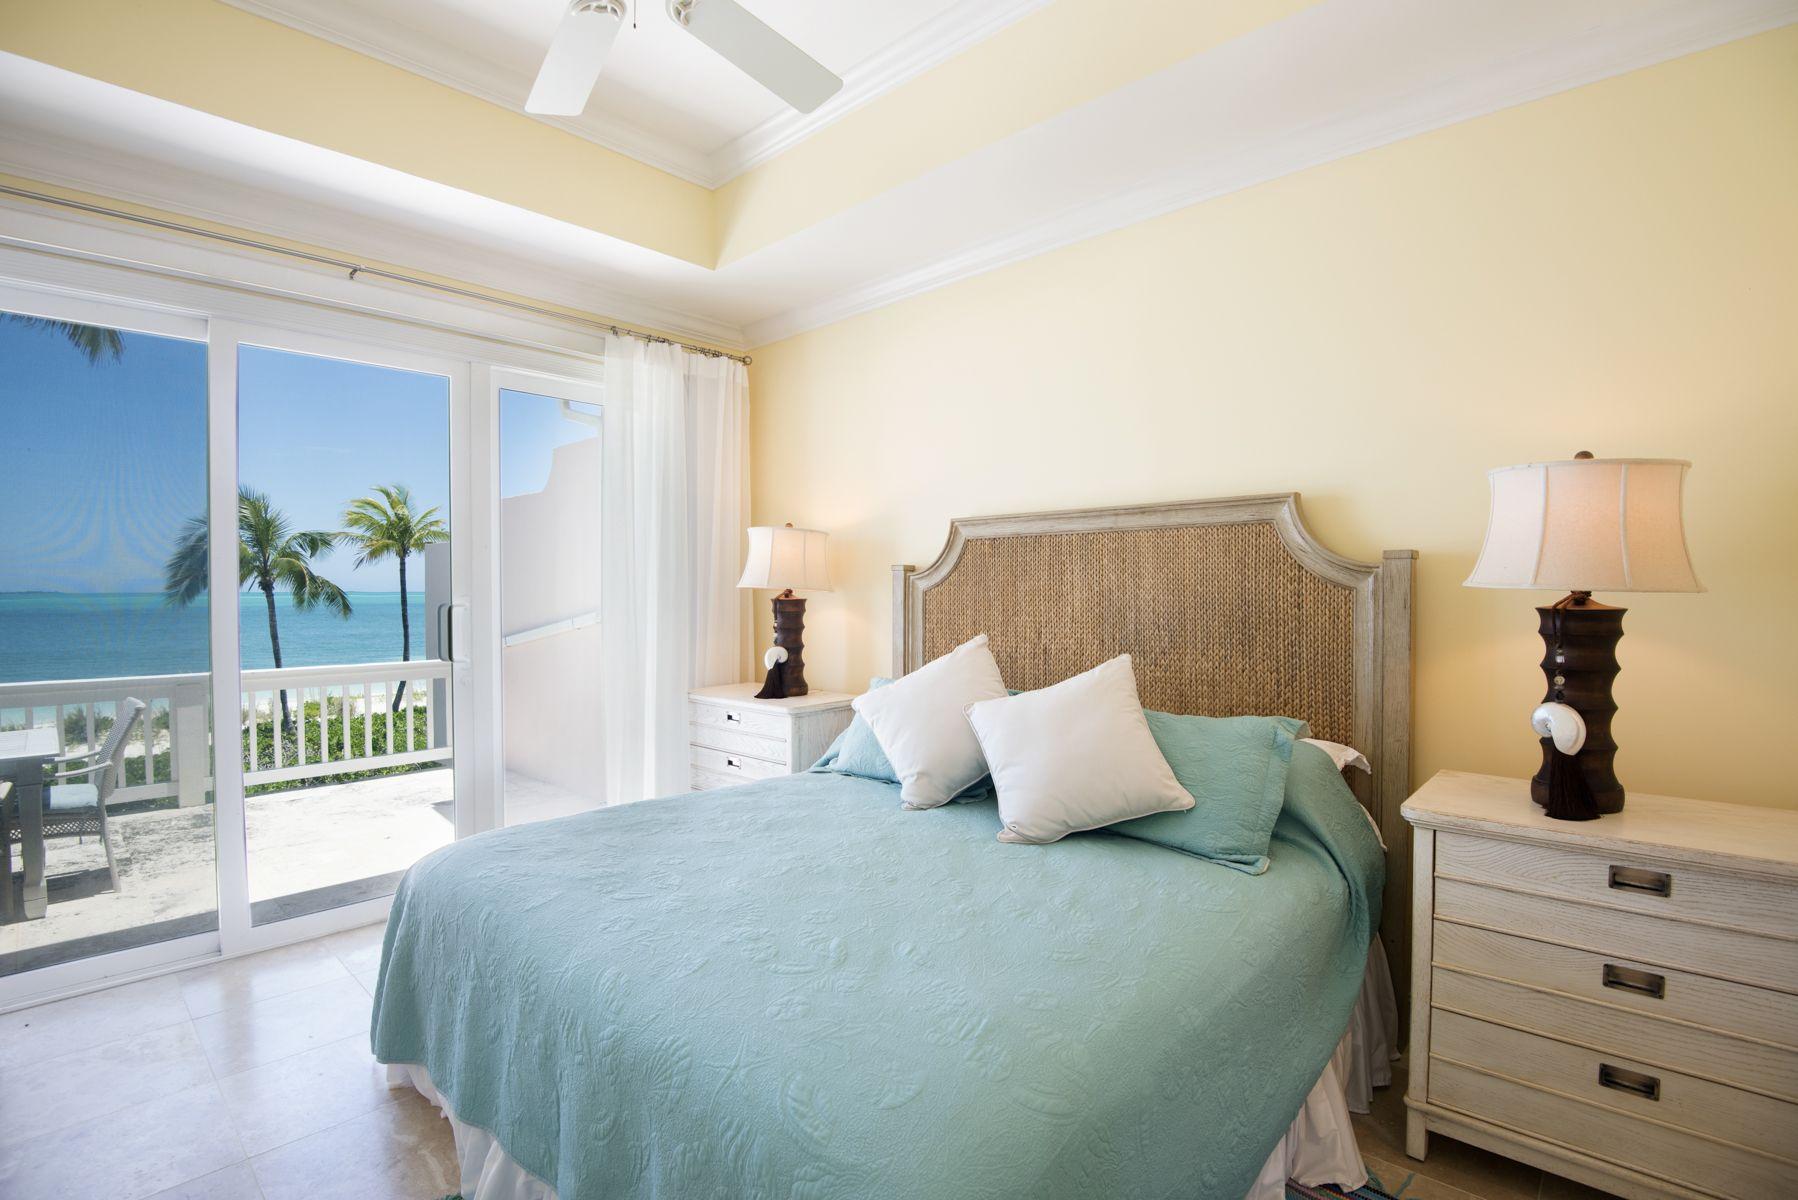 Additional photo for property listing at Royal Poinciana 2504 Treasure Cay, Abaco Bahamas